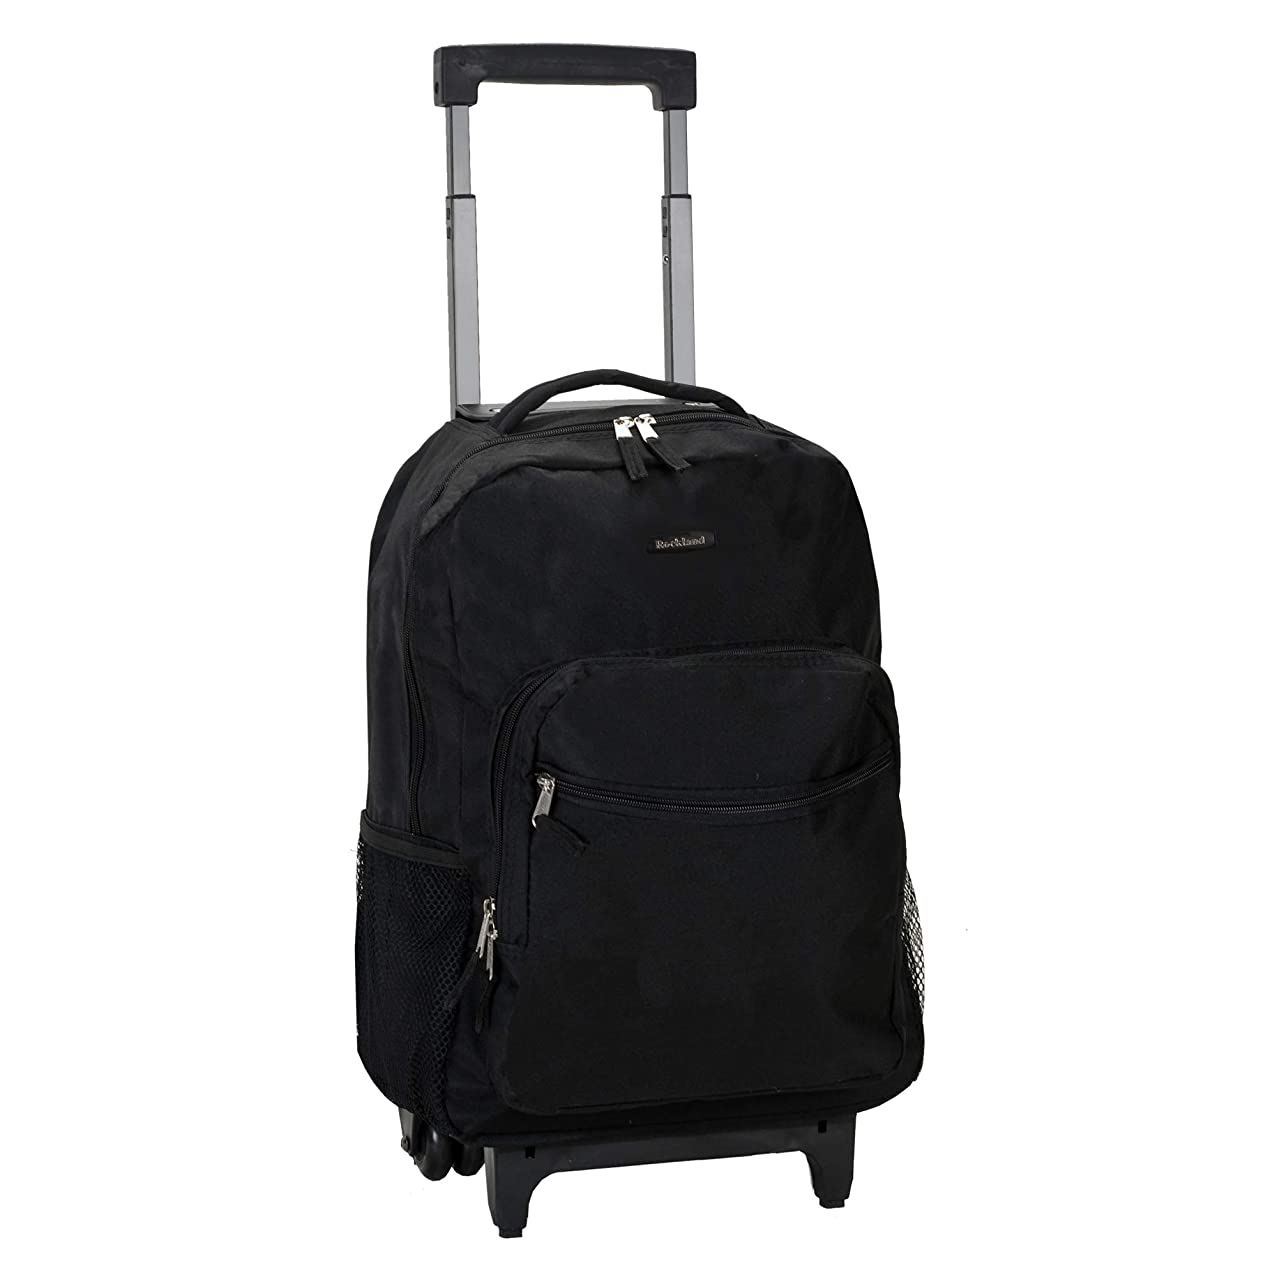 Rockland Luggage 17 Inch Rolling Backpack, Black, Medium